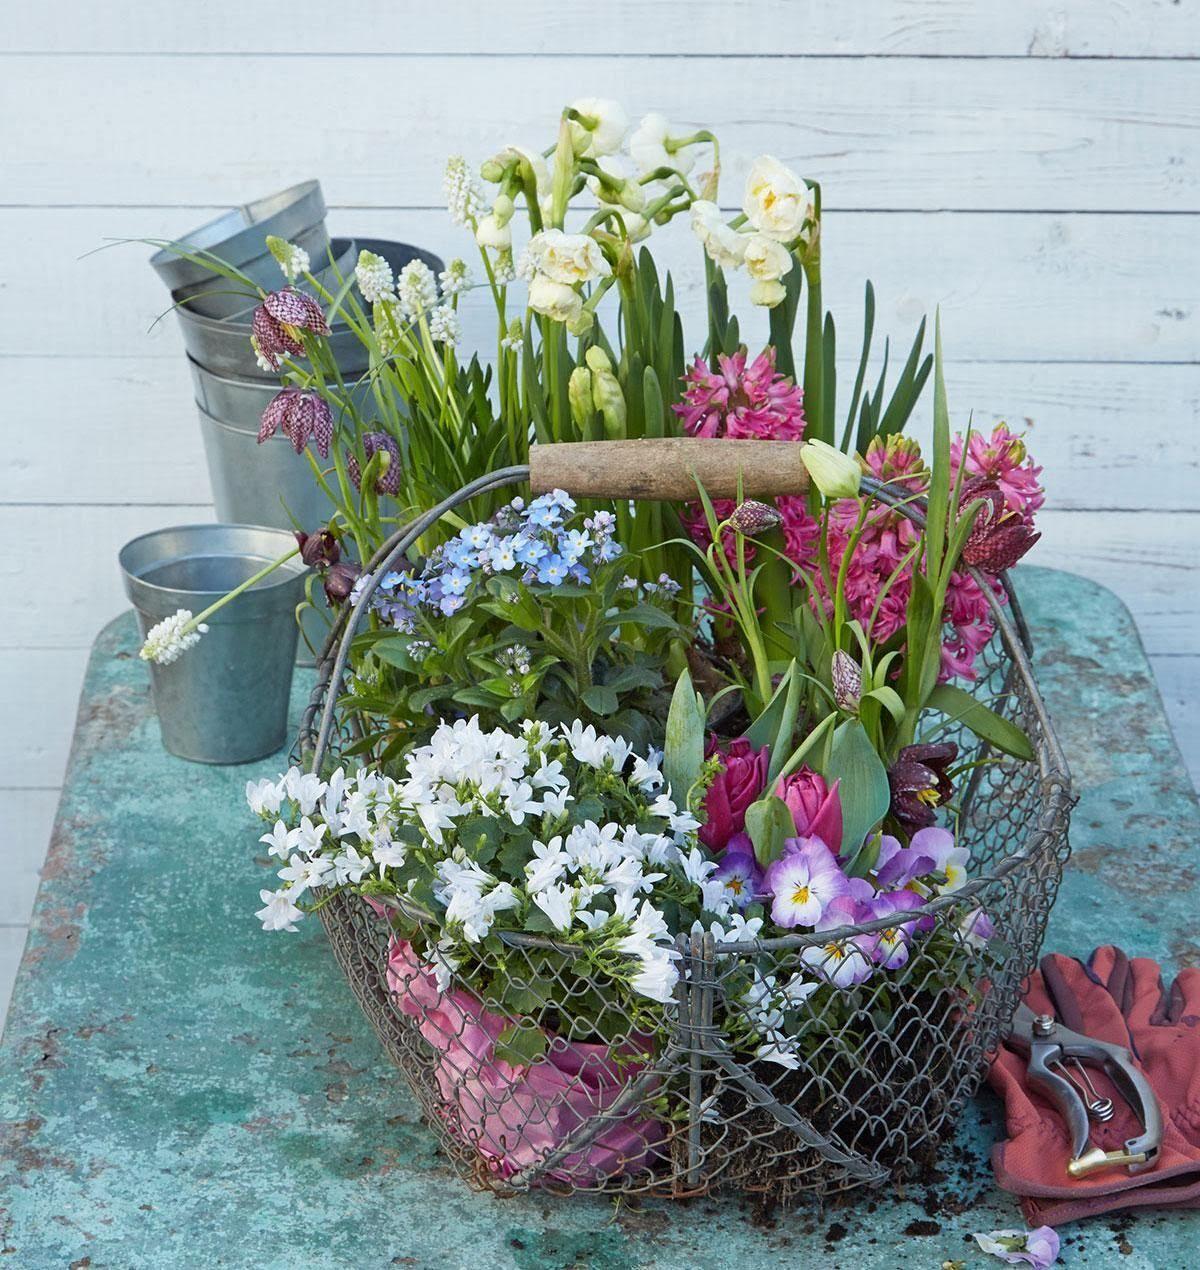 Fr hlingszweige als deko f r die vase tipps und ideen mandelzweige f r die vase let 39 s - Deko mit drahtkorb ...